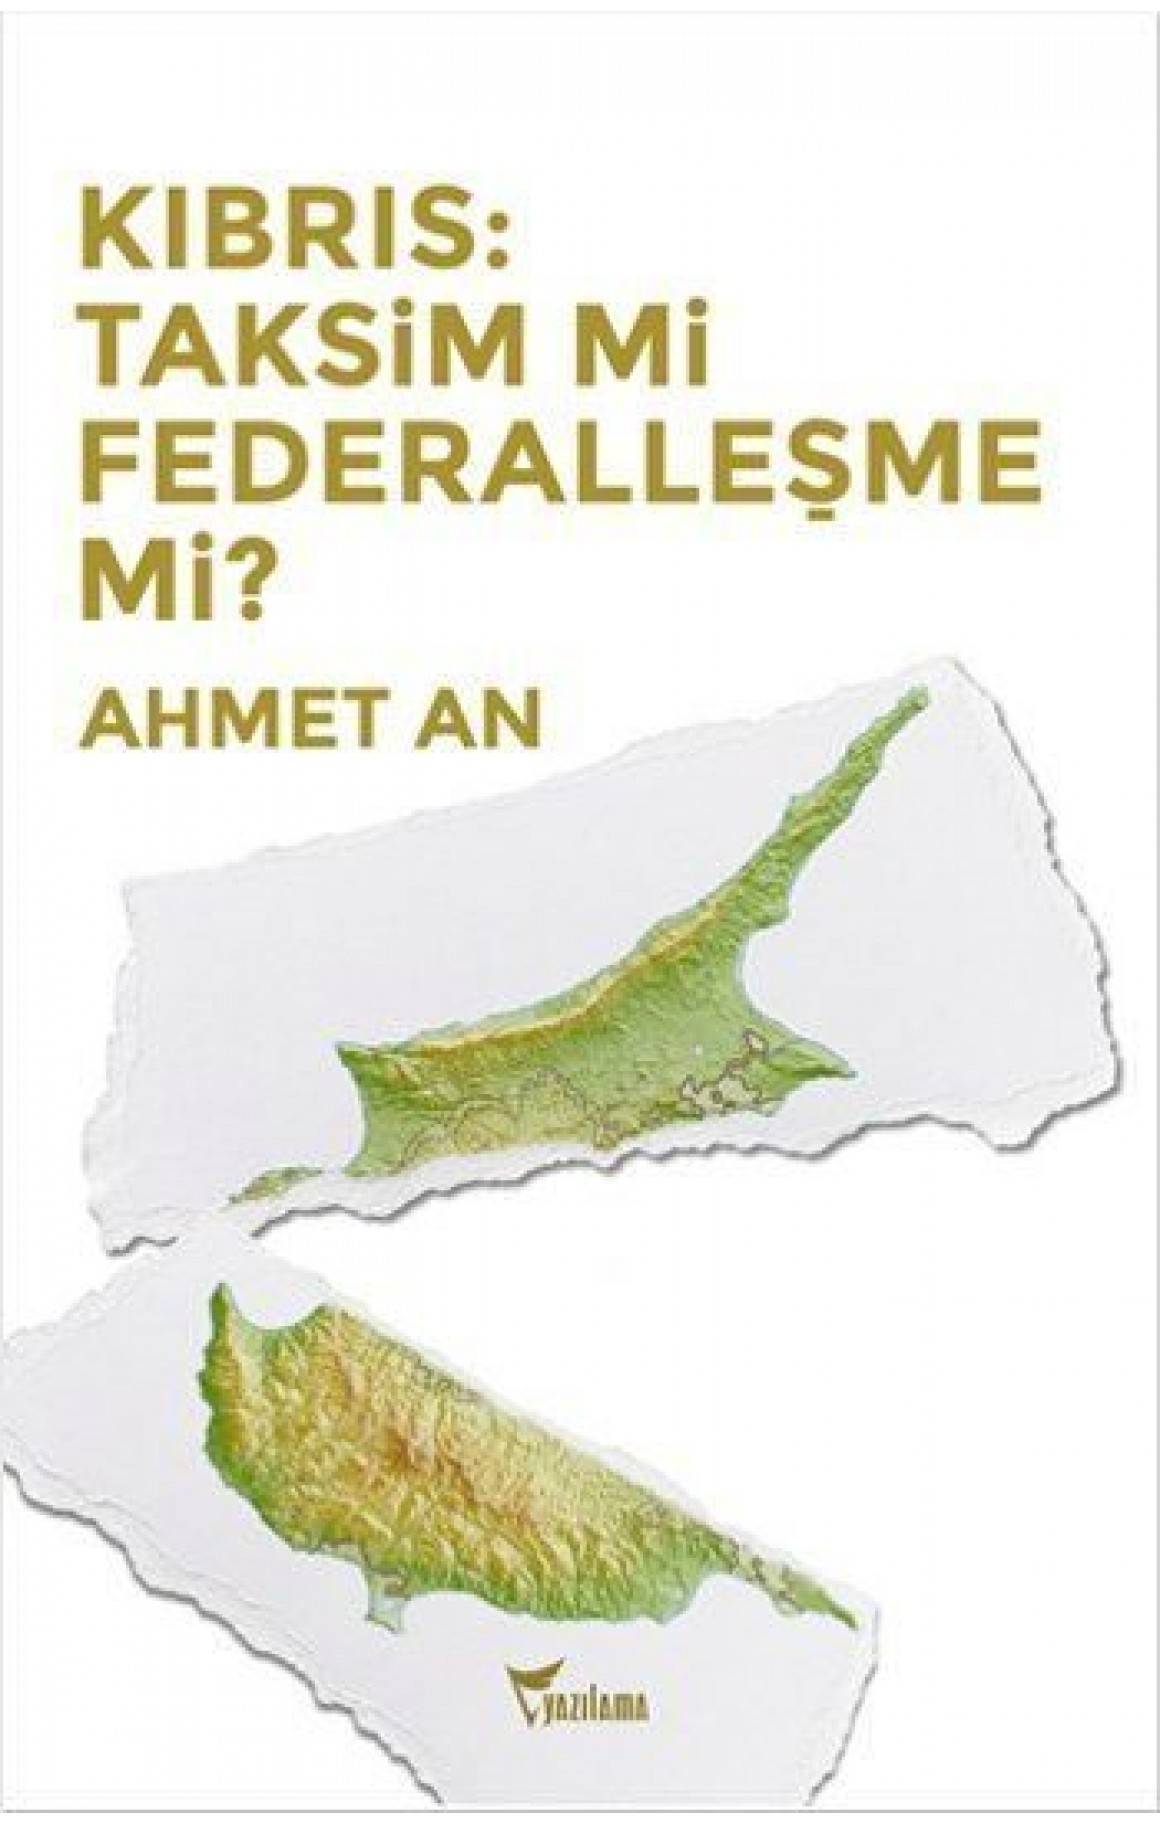 Kıbrıs-Taksim mi Federalleşme mi?